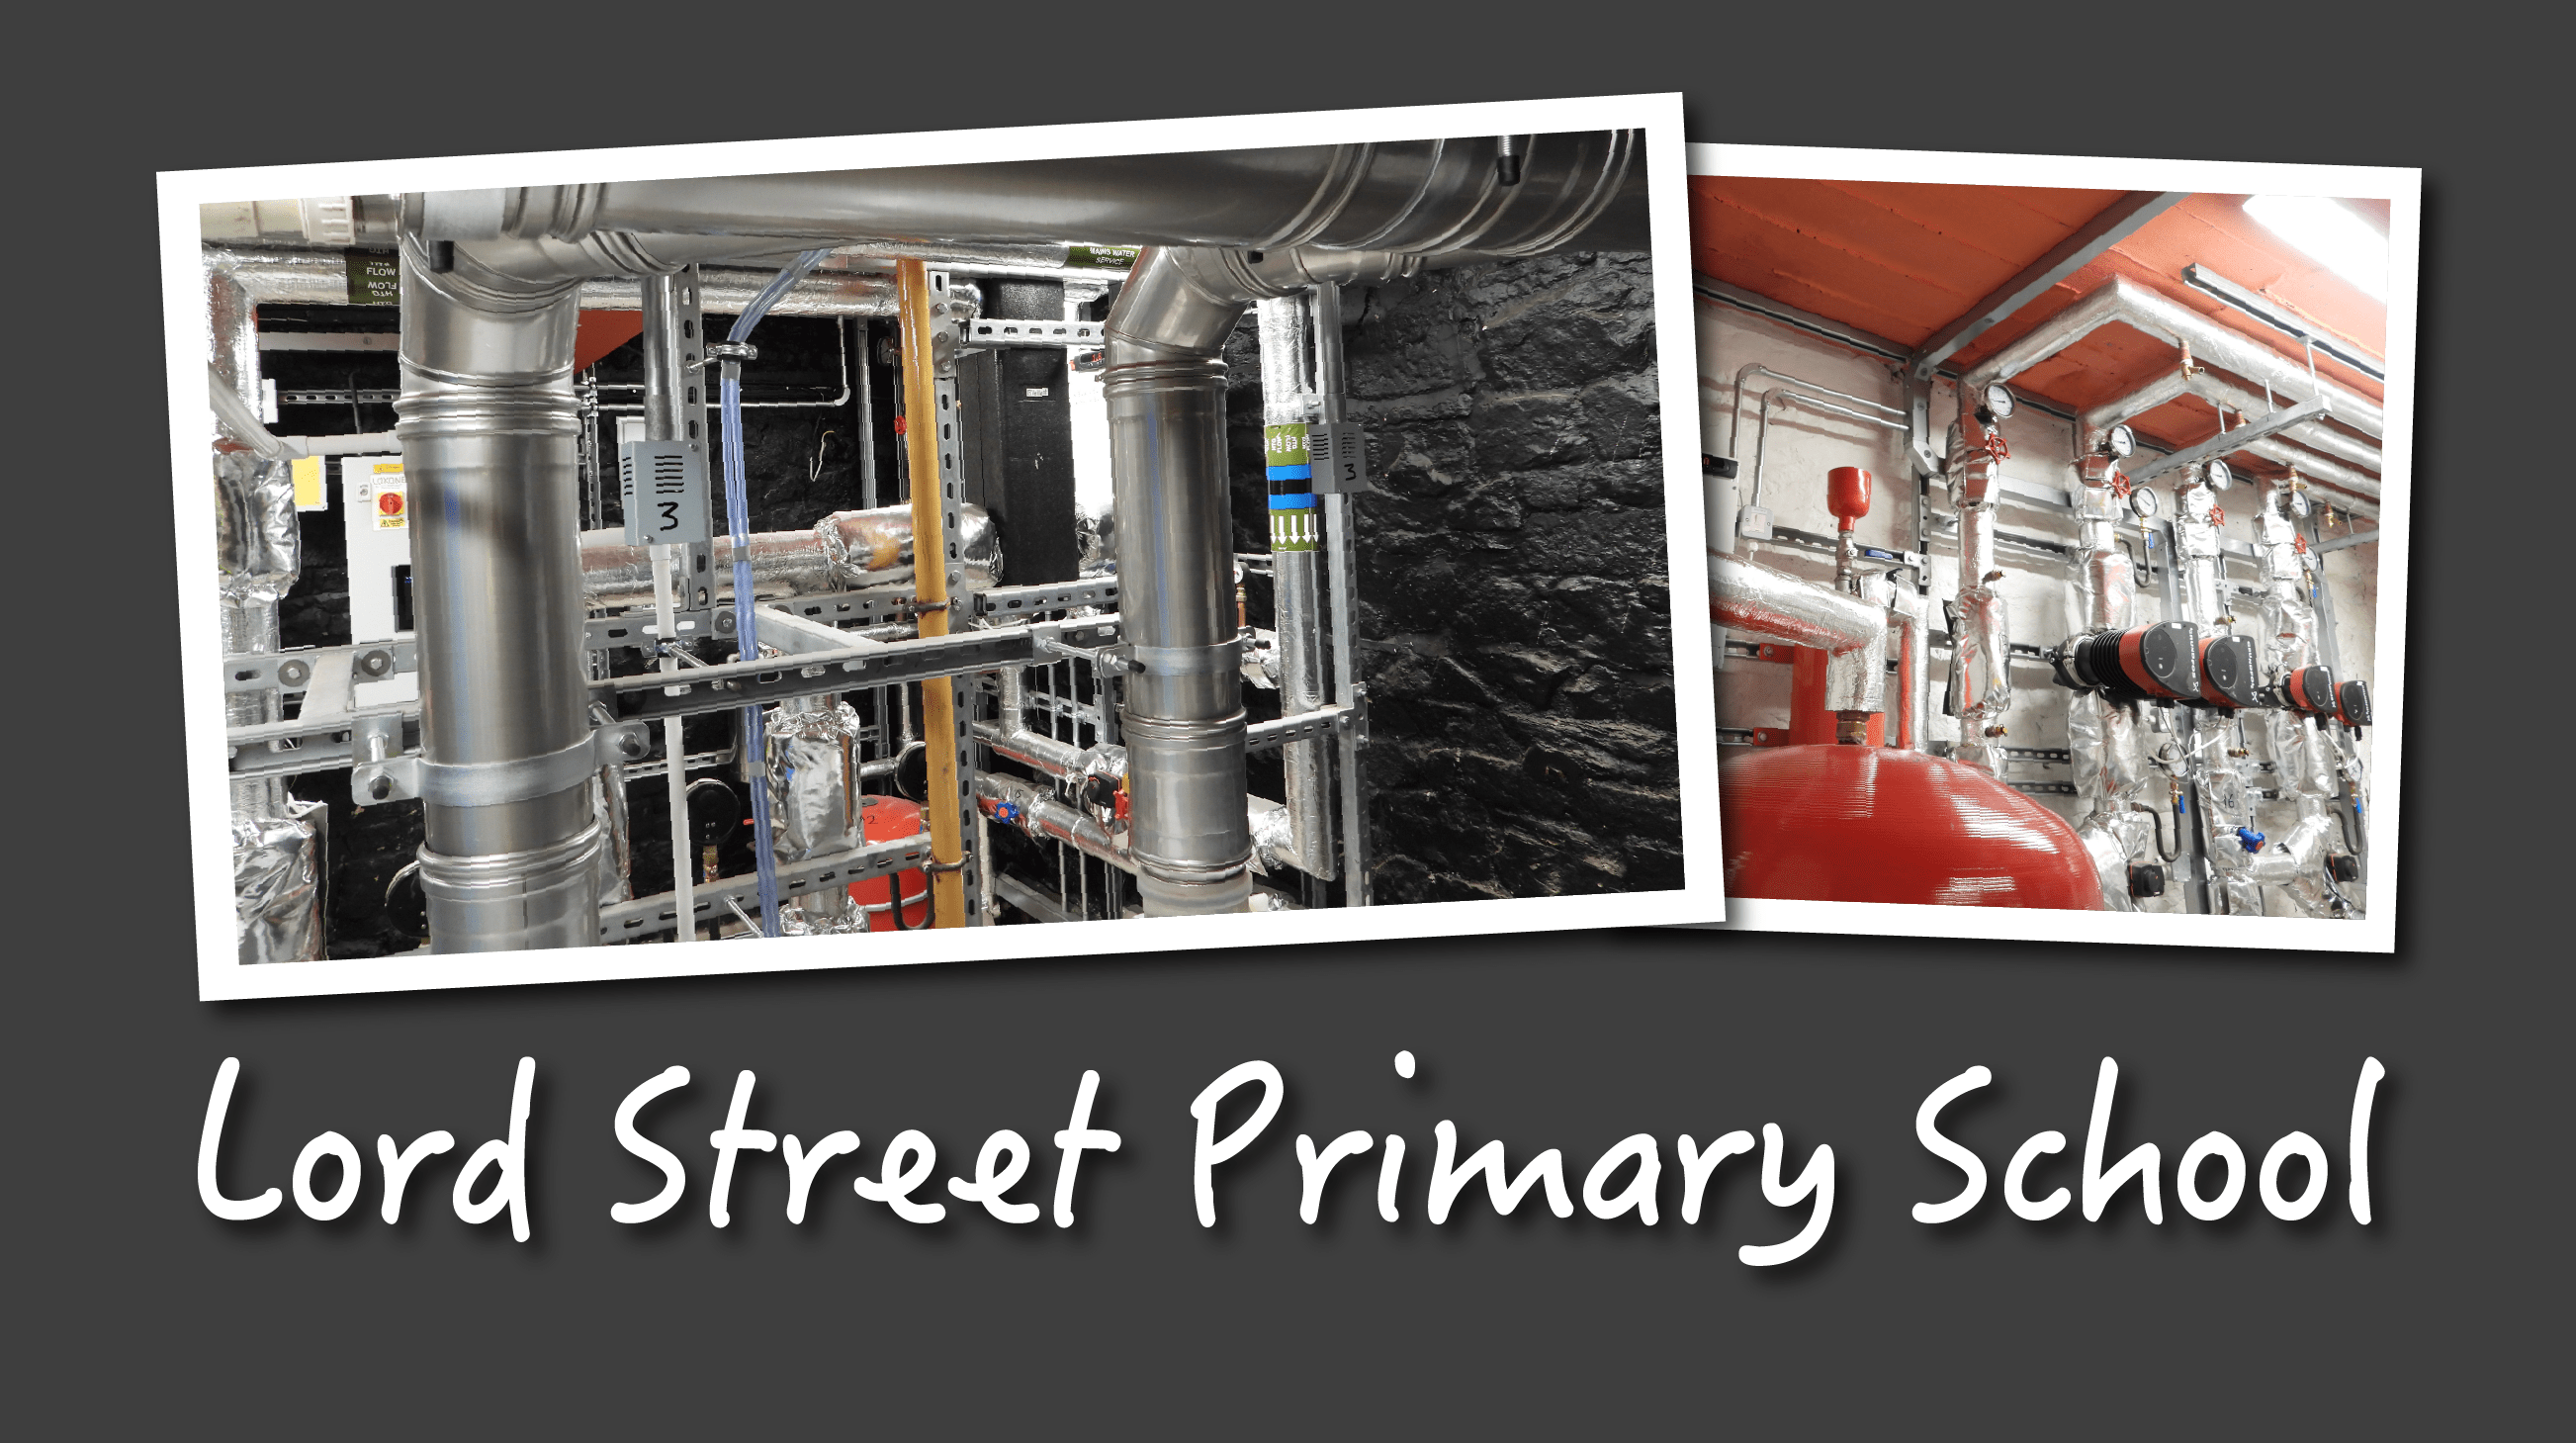 lord street primary school-06